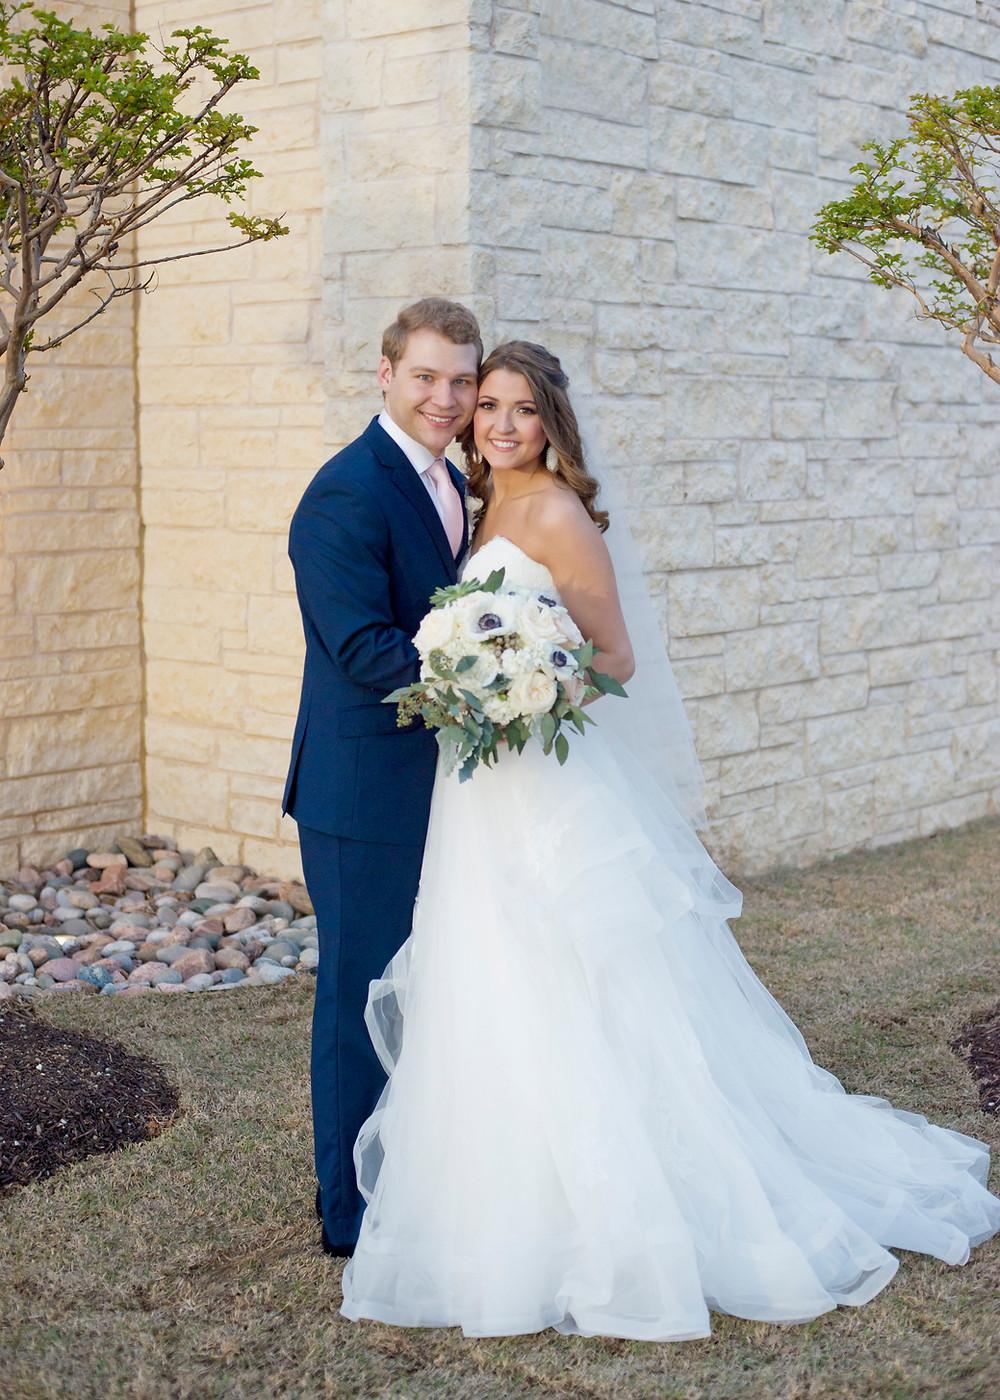 bride and groom in navy suit